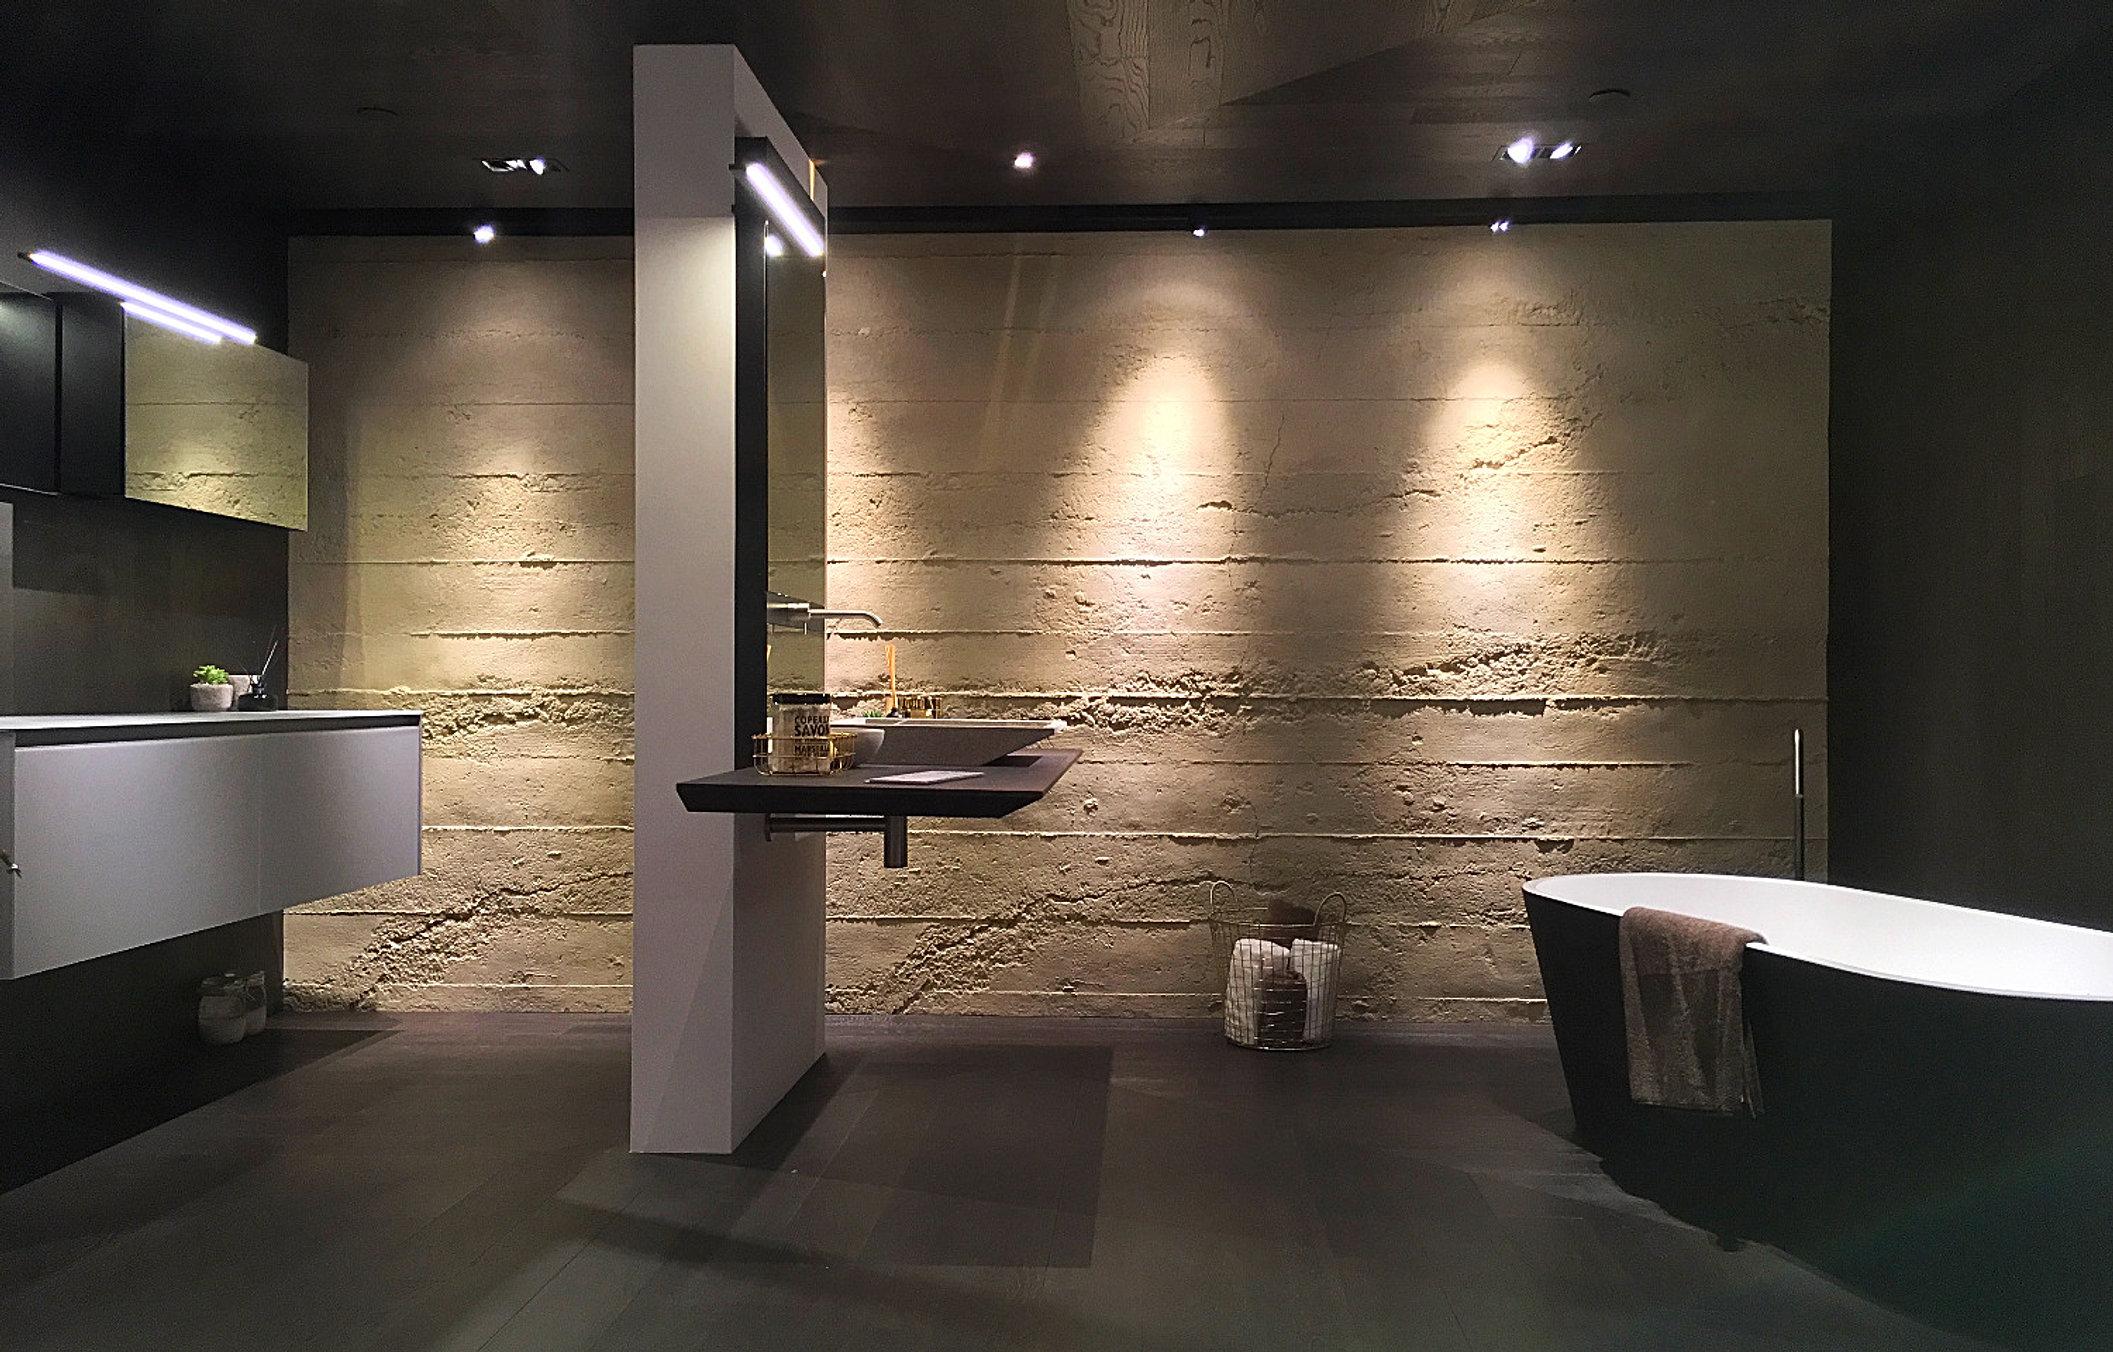 Raumgestaltungs Ideen interior design raumgestaltungs ideen luxuswall